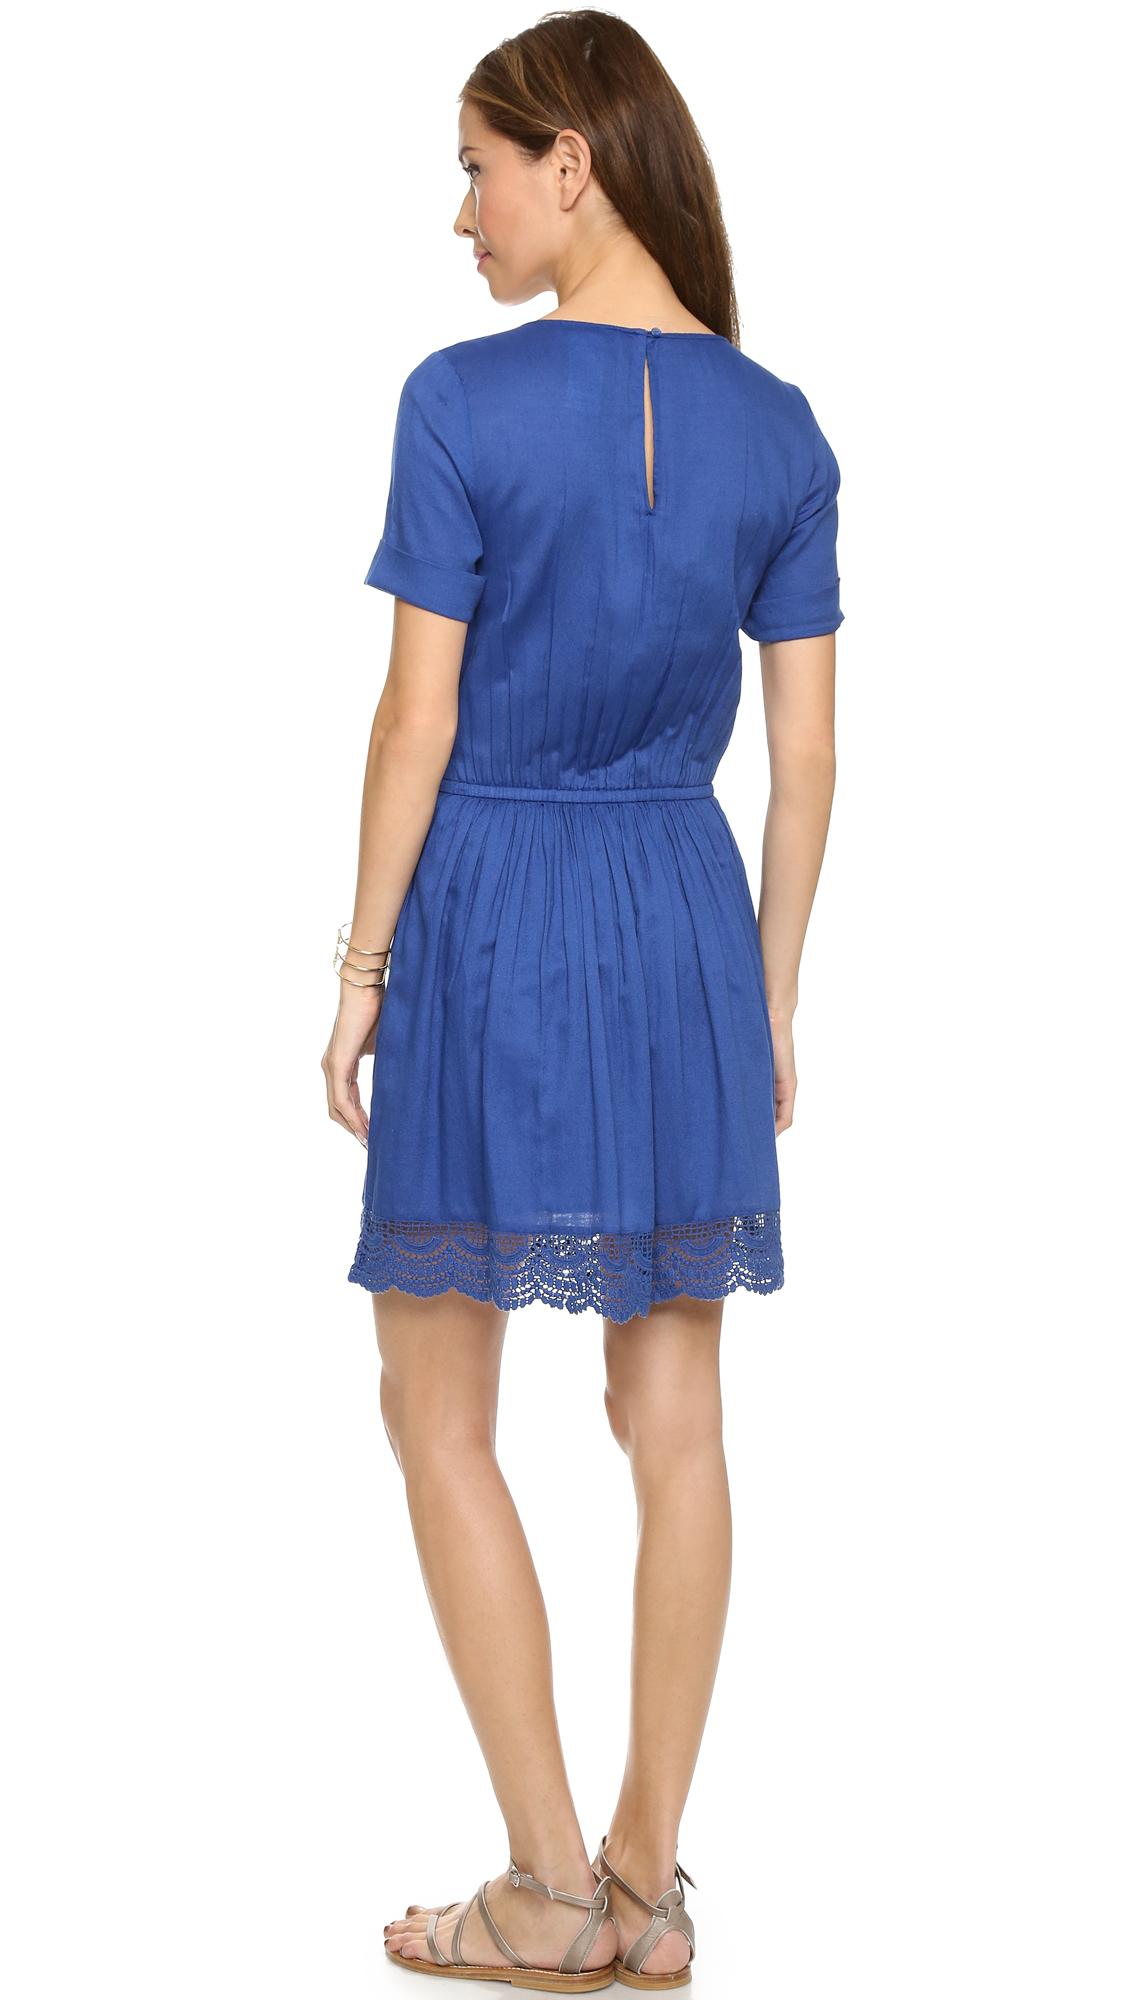 lyst paul joe timbales dress blue in blue. Black Bedroom Furniture Sets. Home Design Ideas